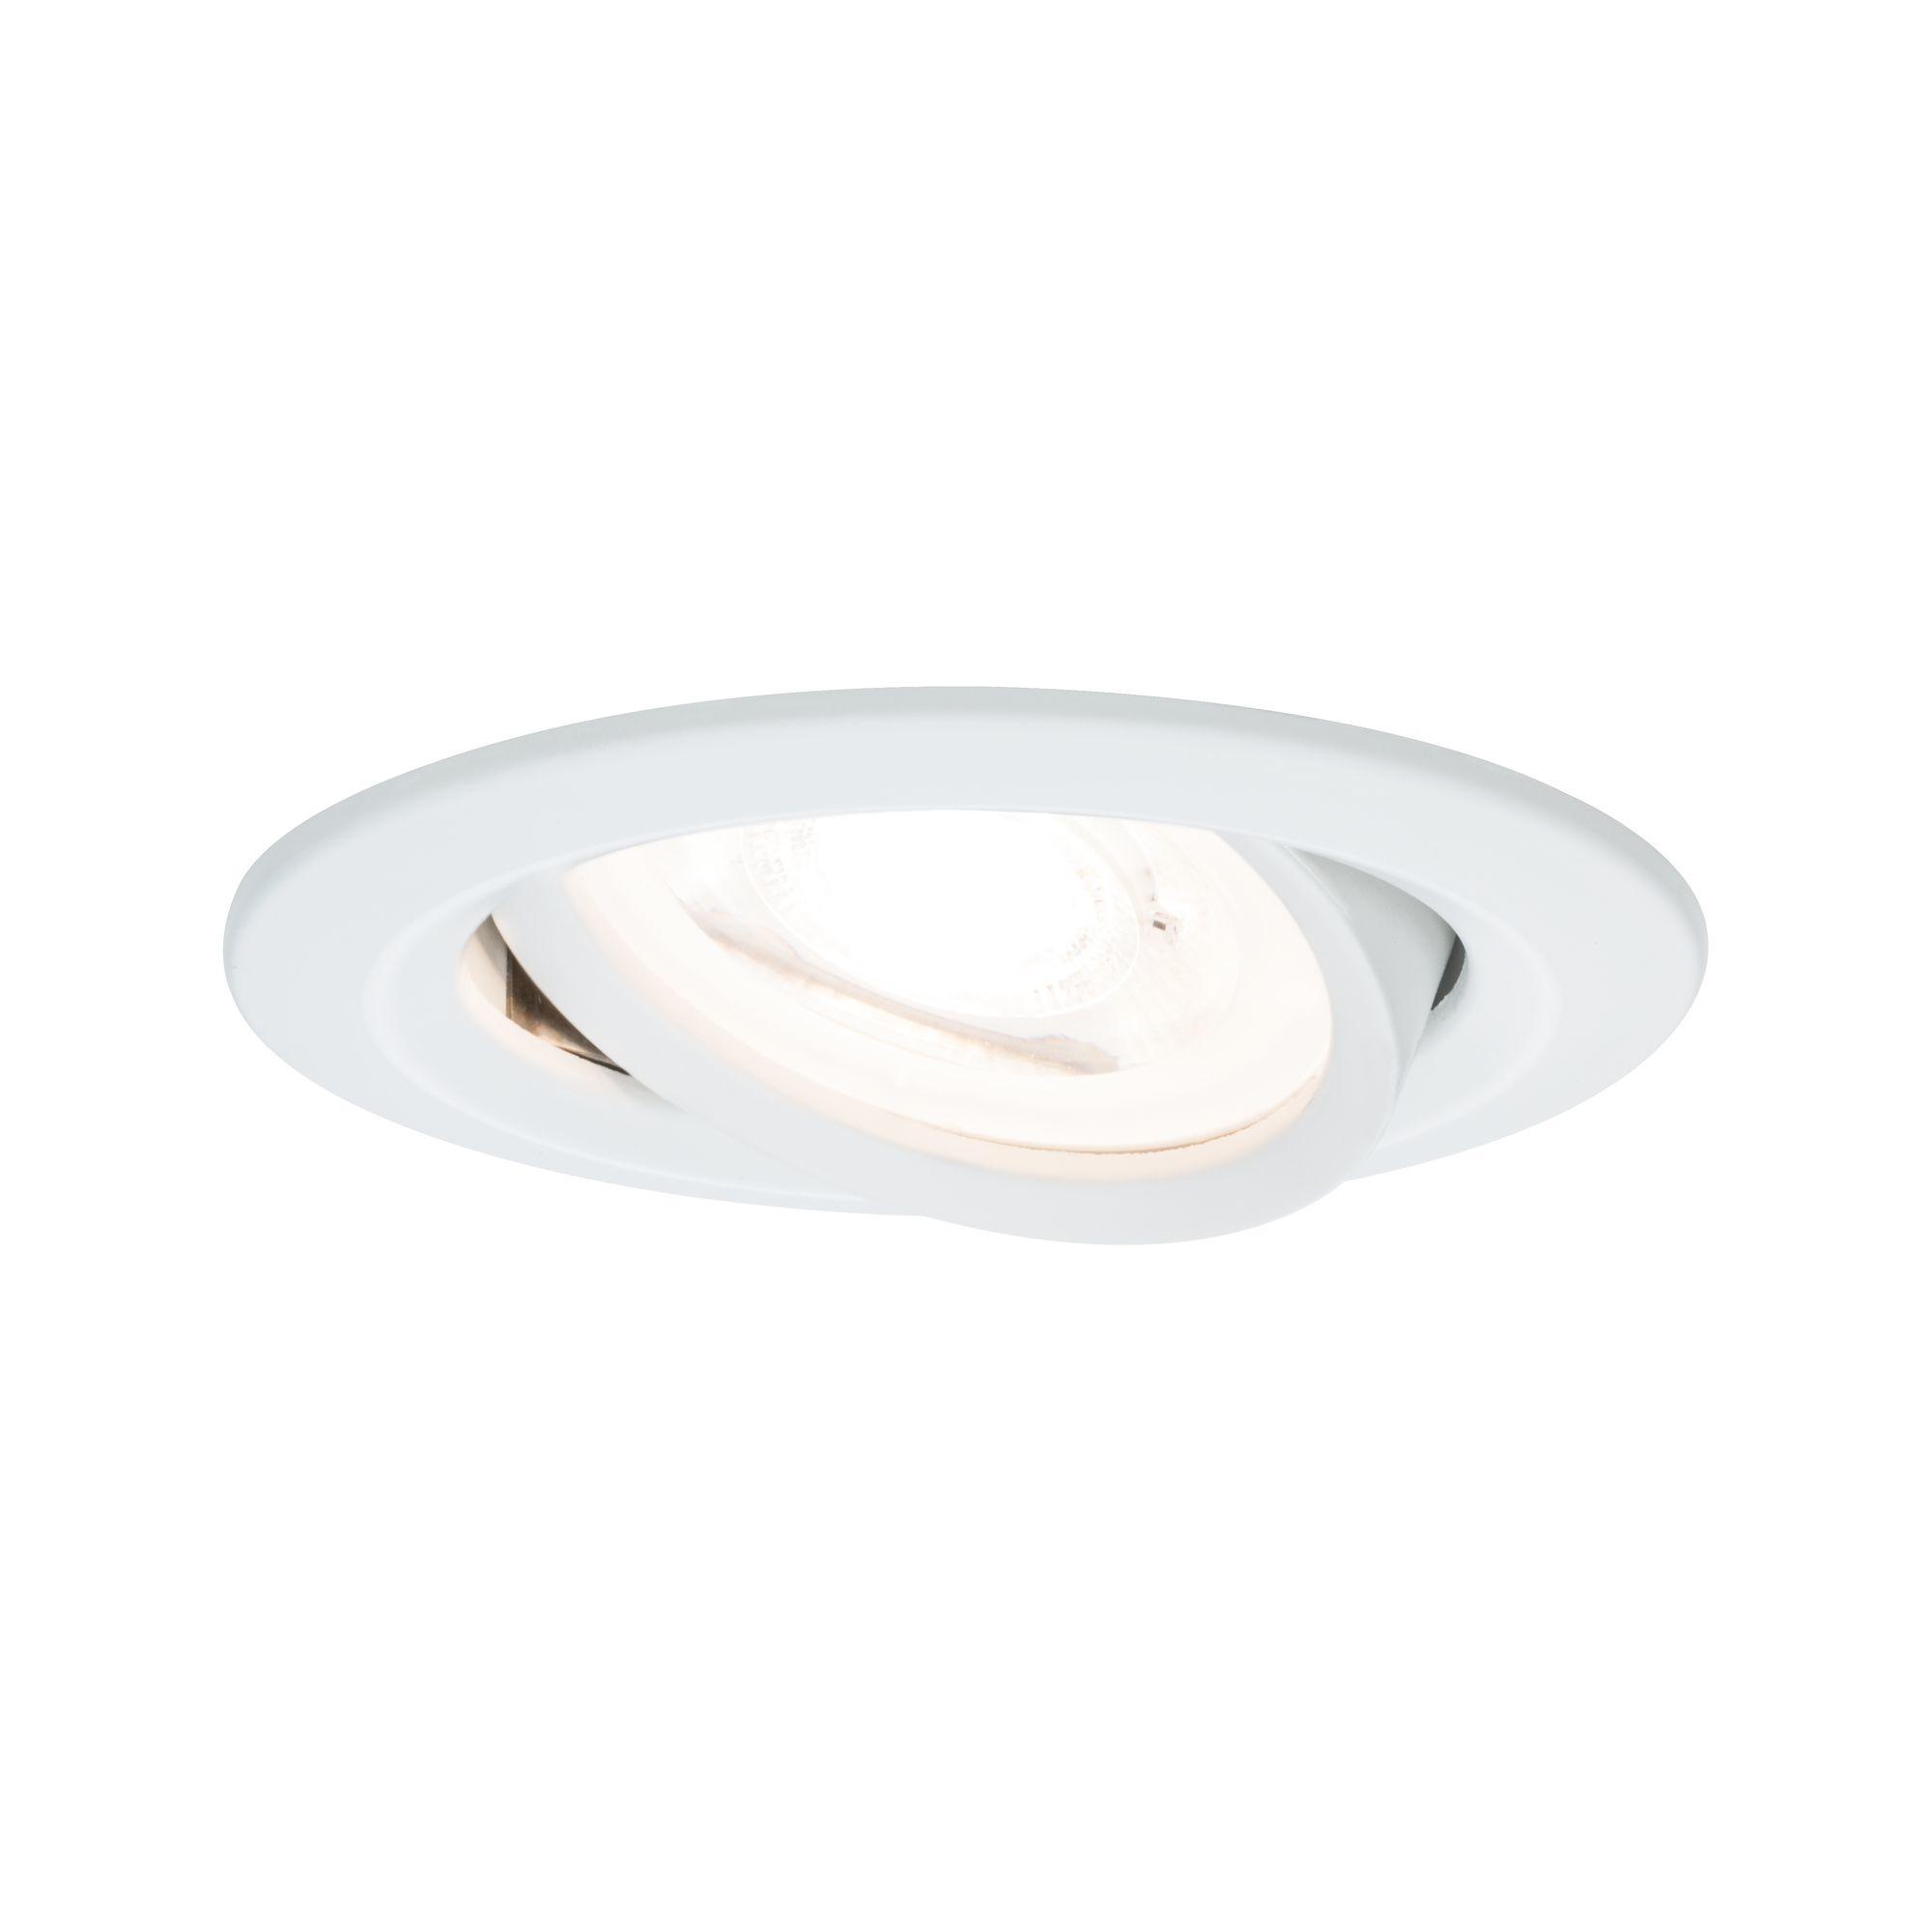 Paulmann EBL Set Nova rund schwenkbar LED 1x6,5W2700K 230V GU10 51mm Weiß matt/Alu